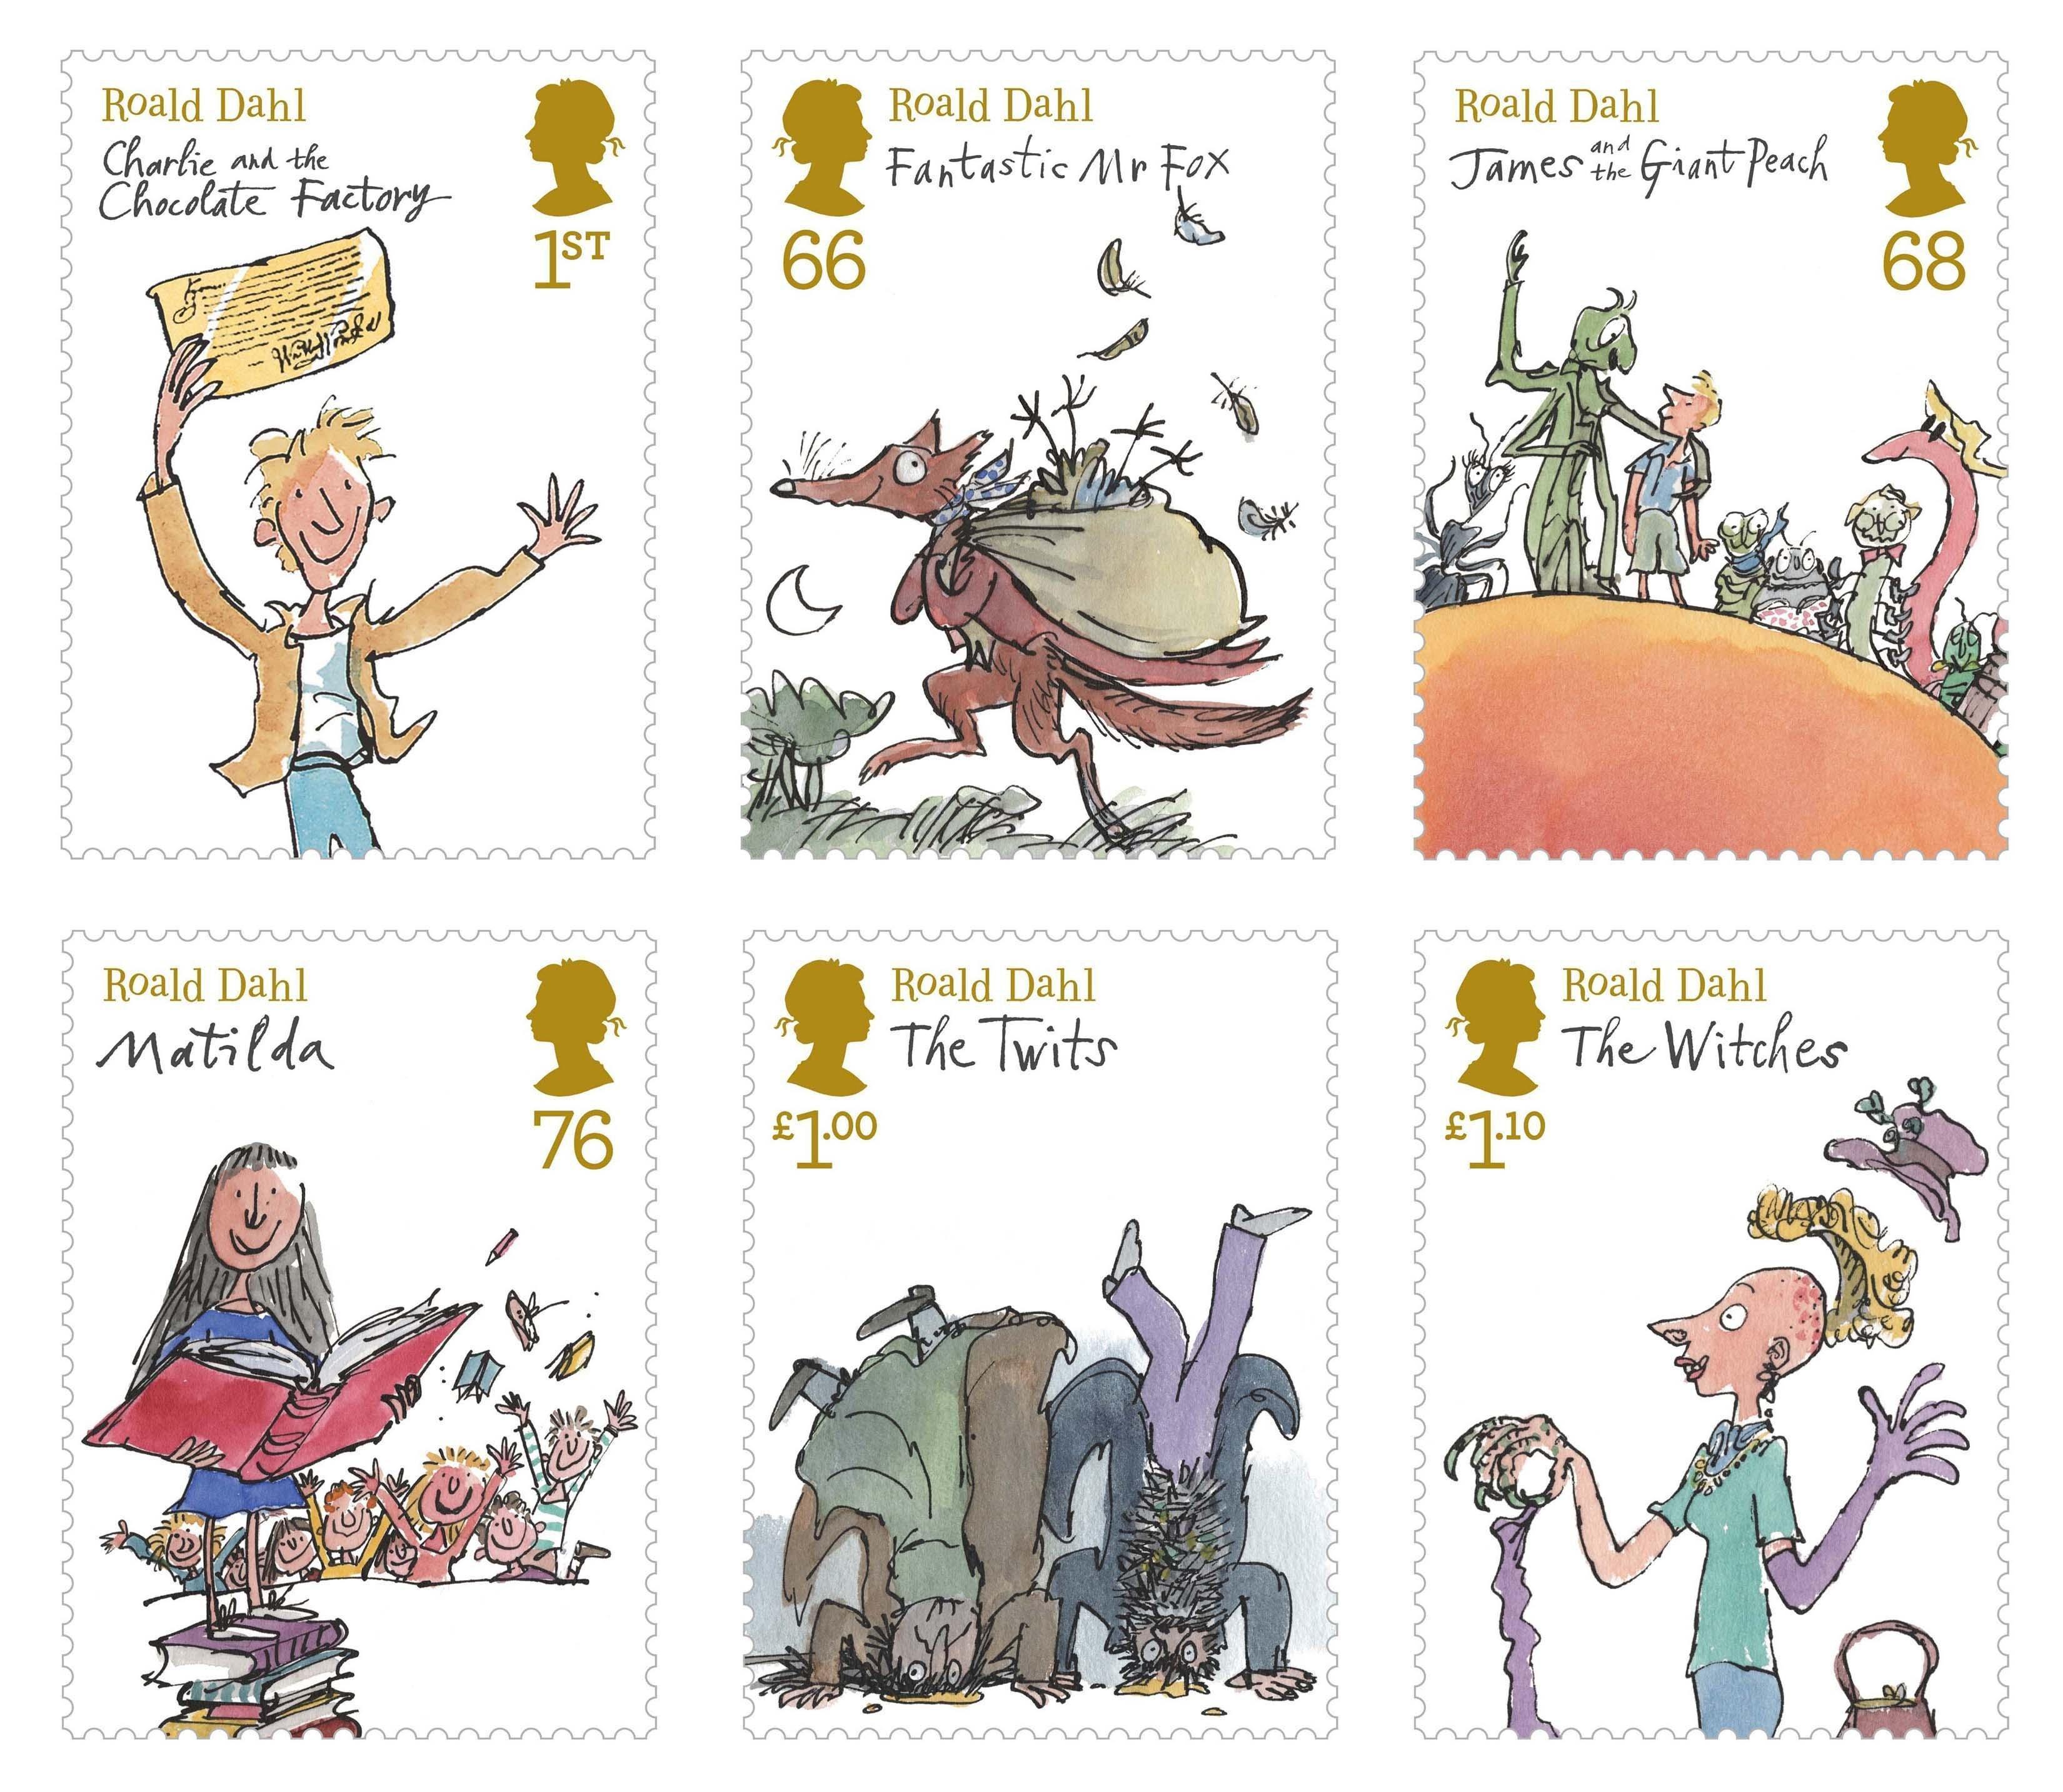 Netflix To Create Shows Based On Roald Dahl's Books